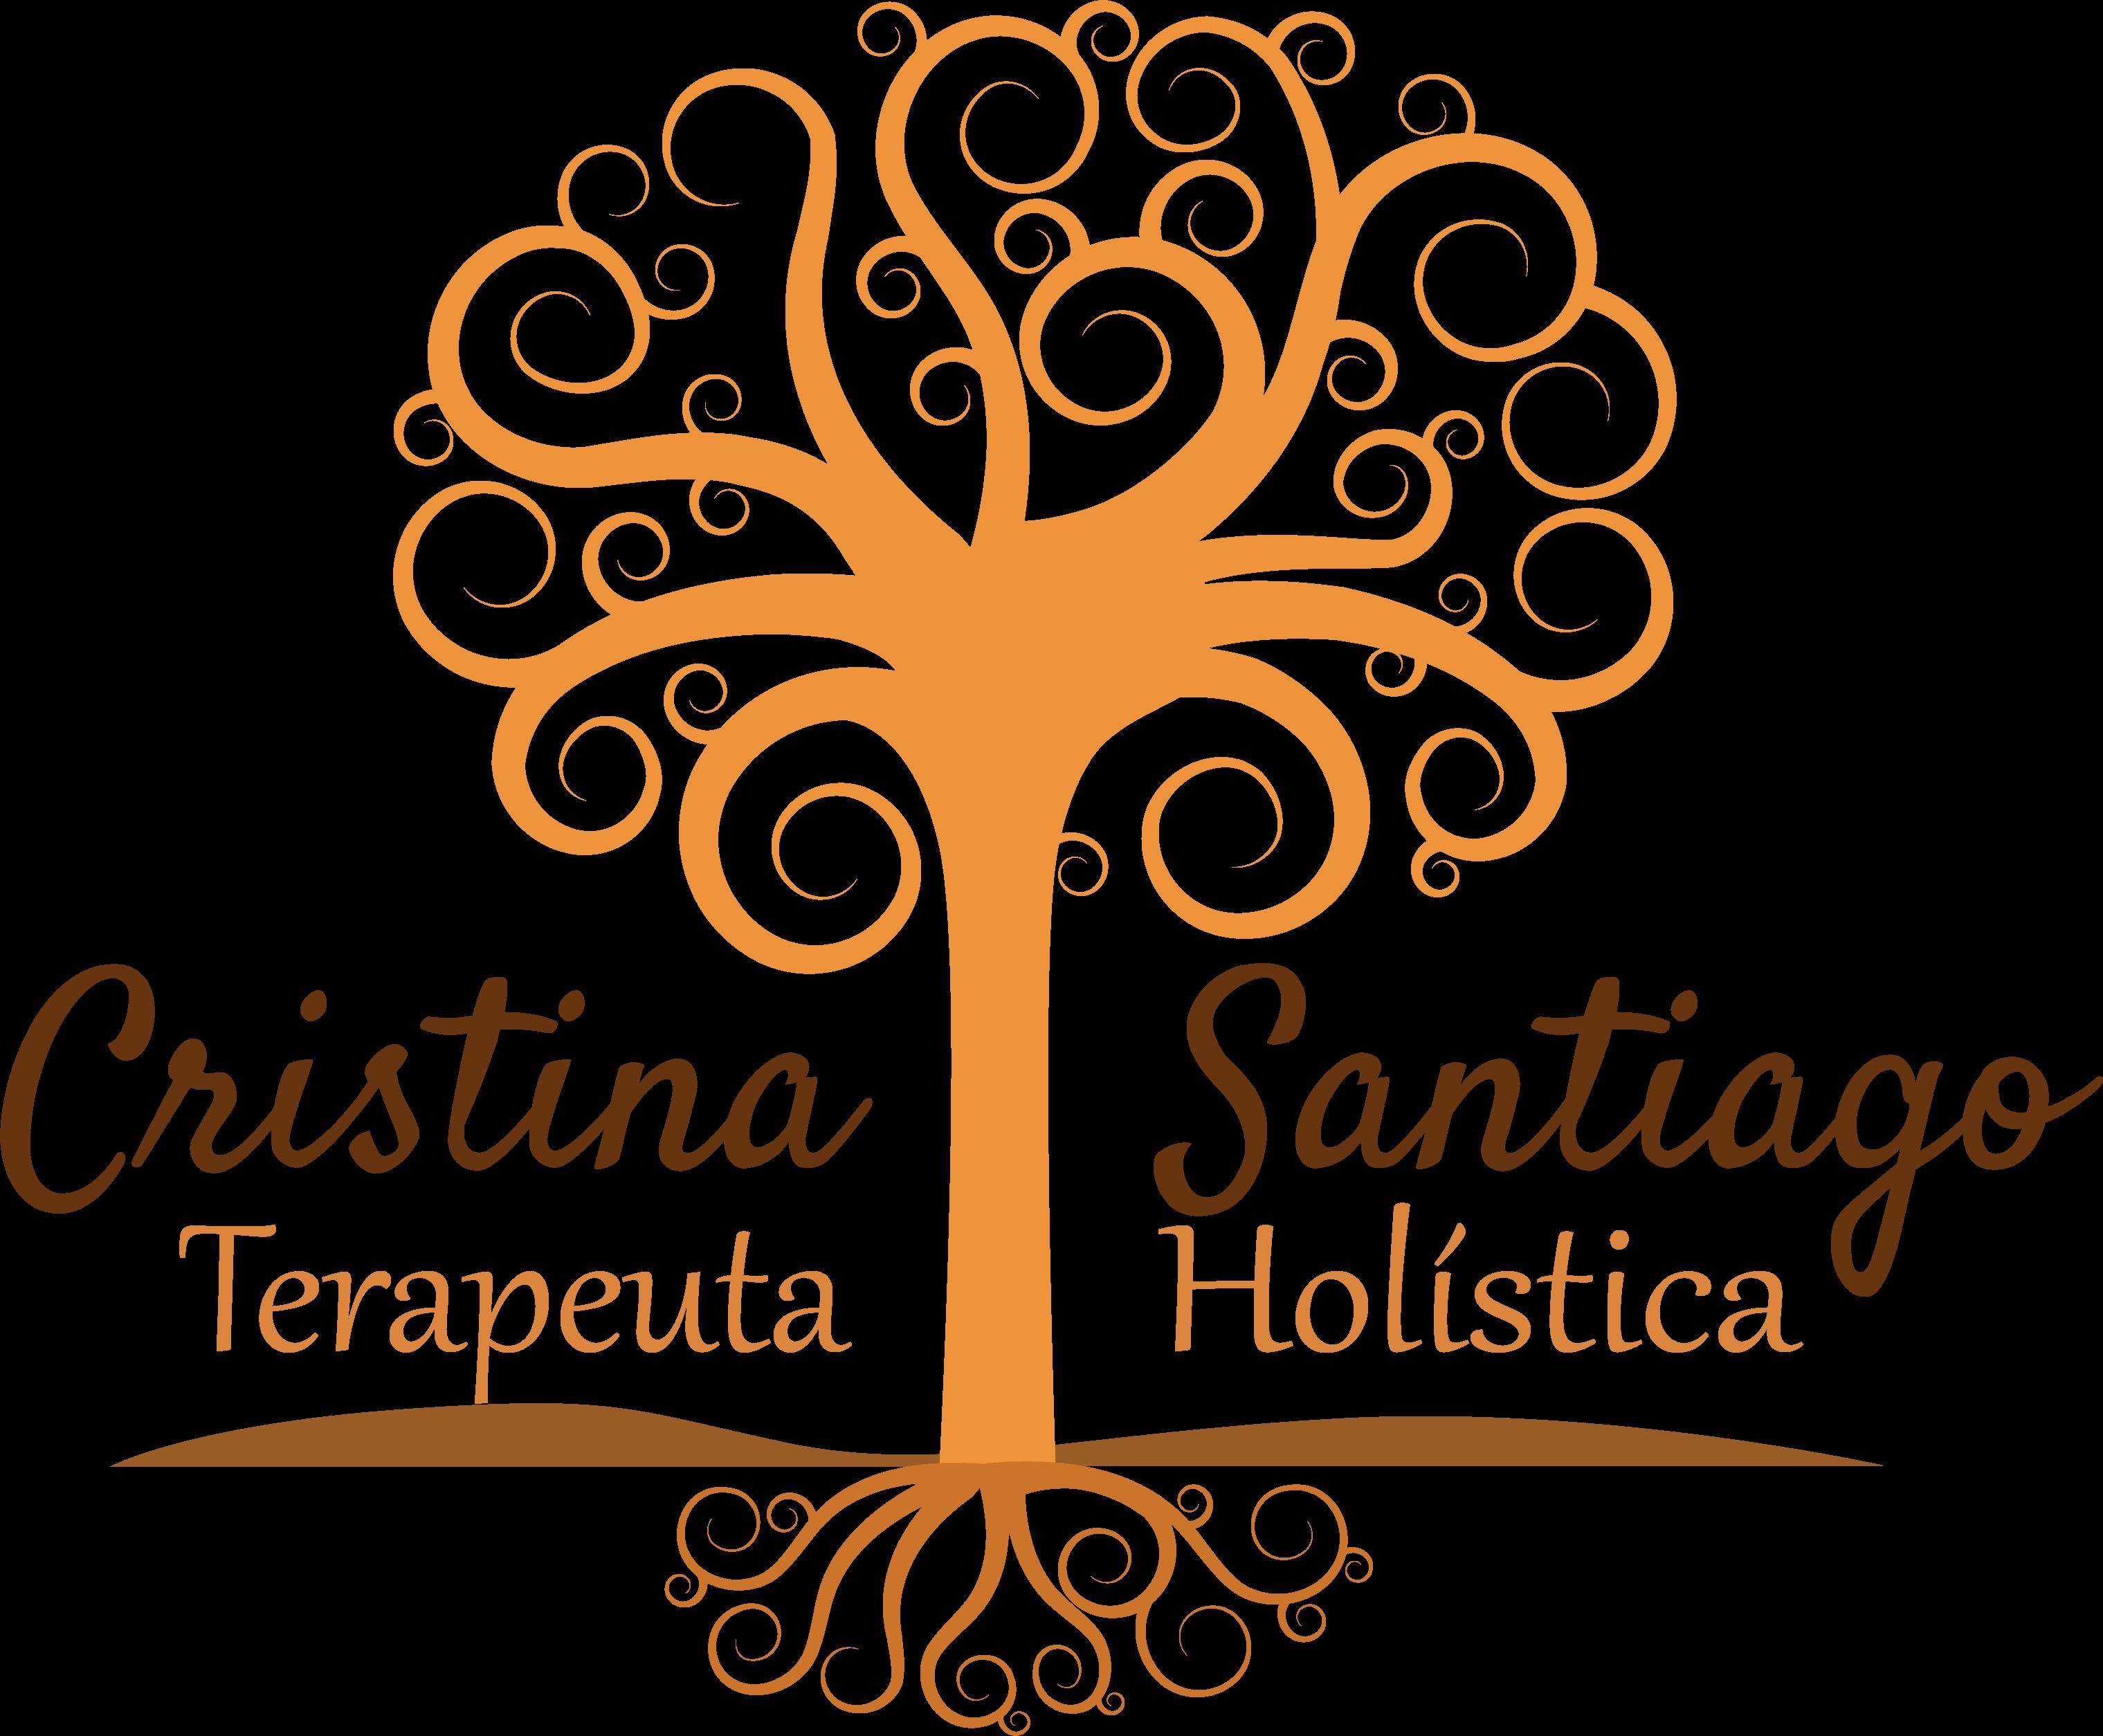 Cristina Santiago Terapeuta Holística